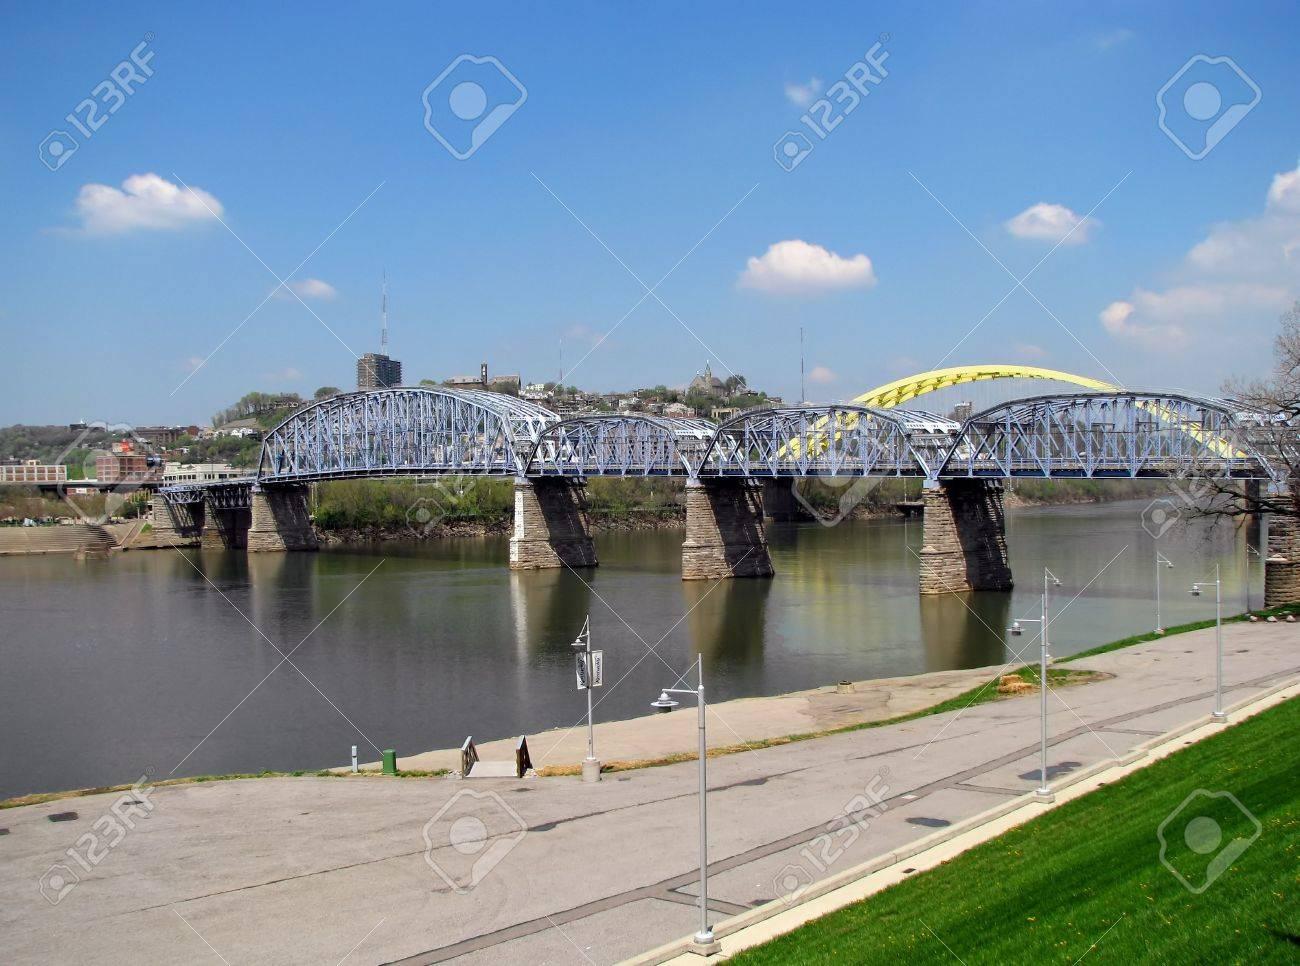 bridges over the Ohio river Cincinnati Kentucky Stock Photo - 3842932